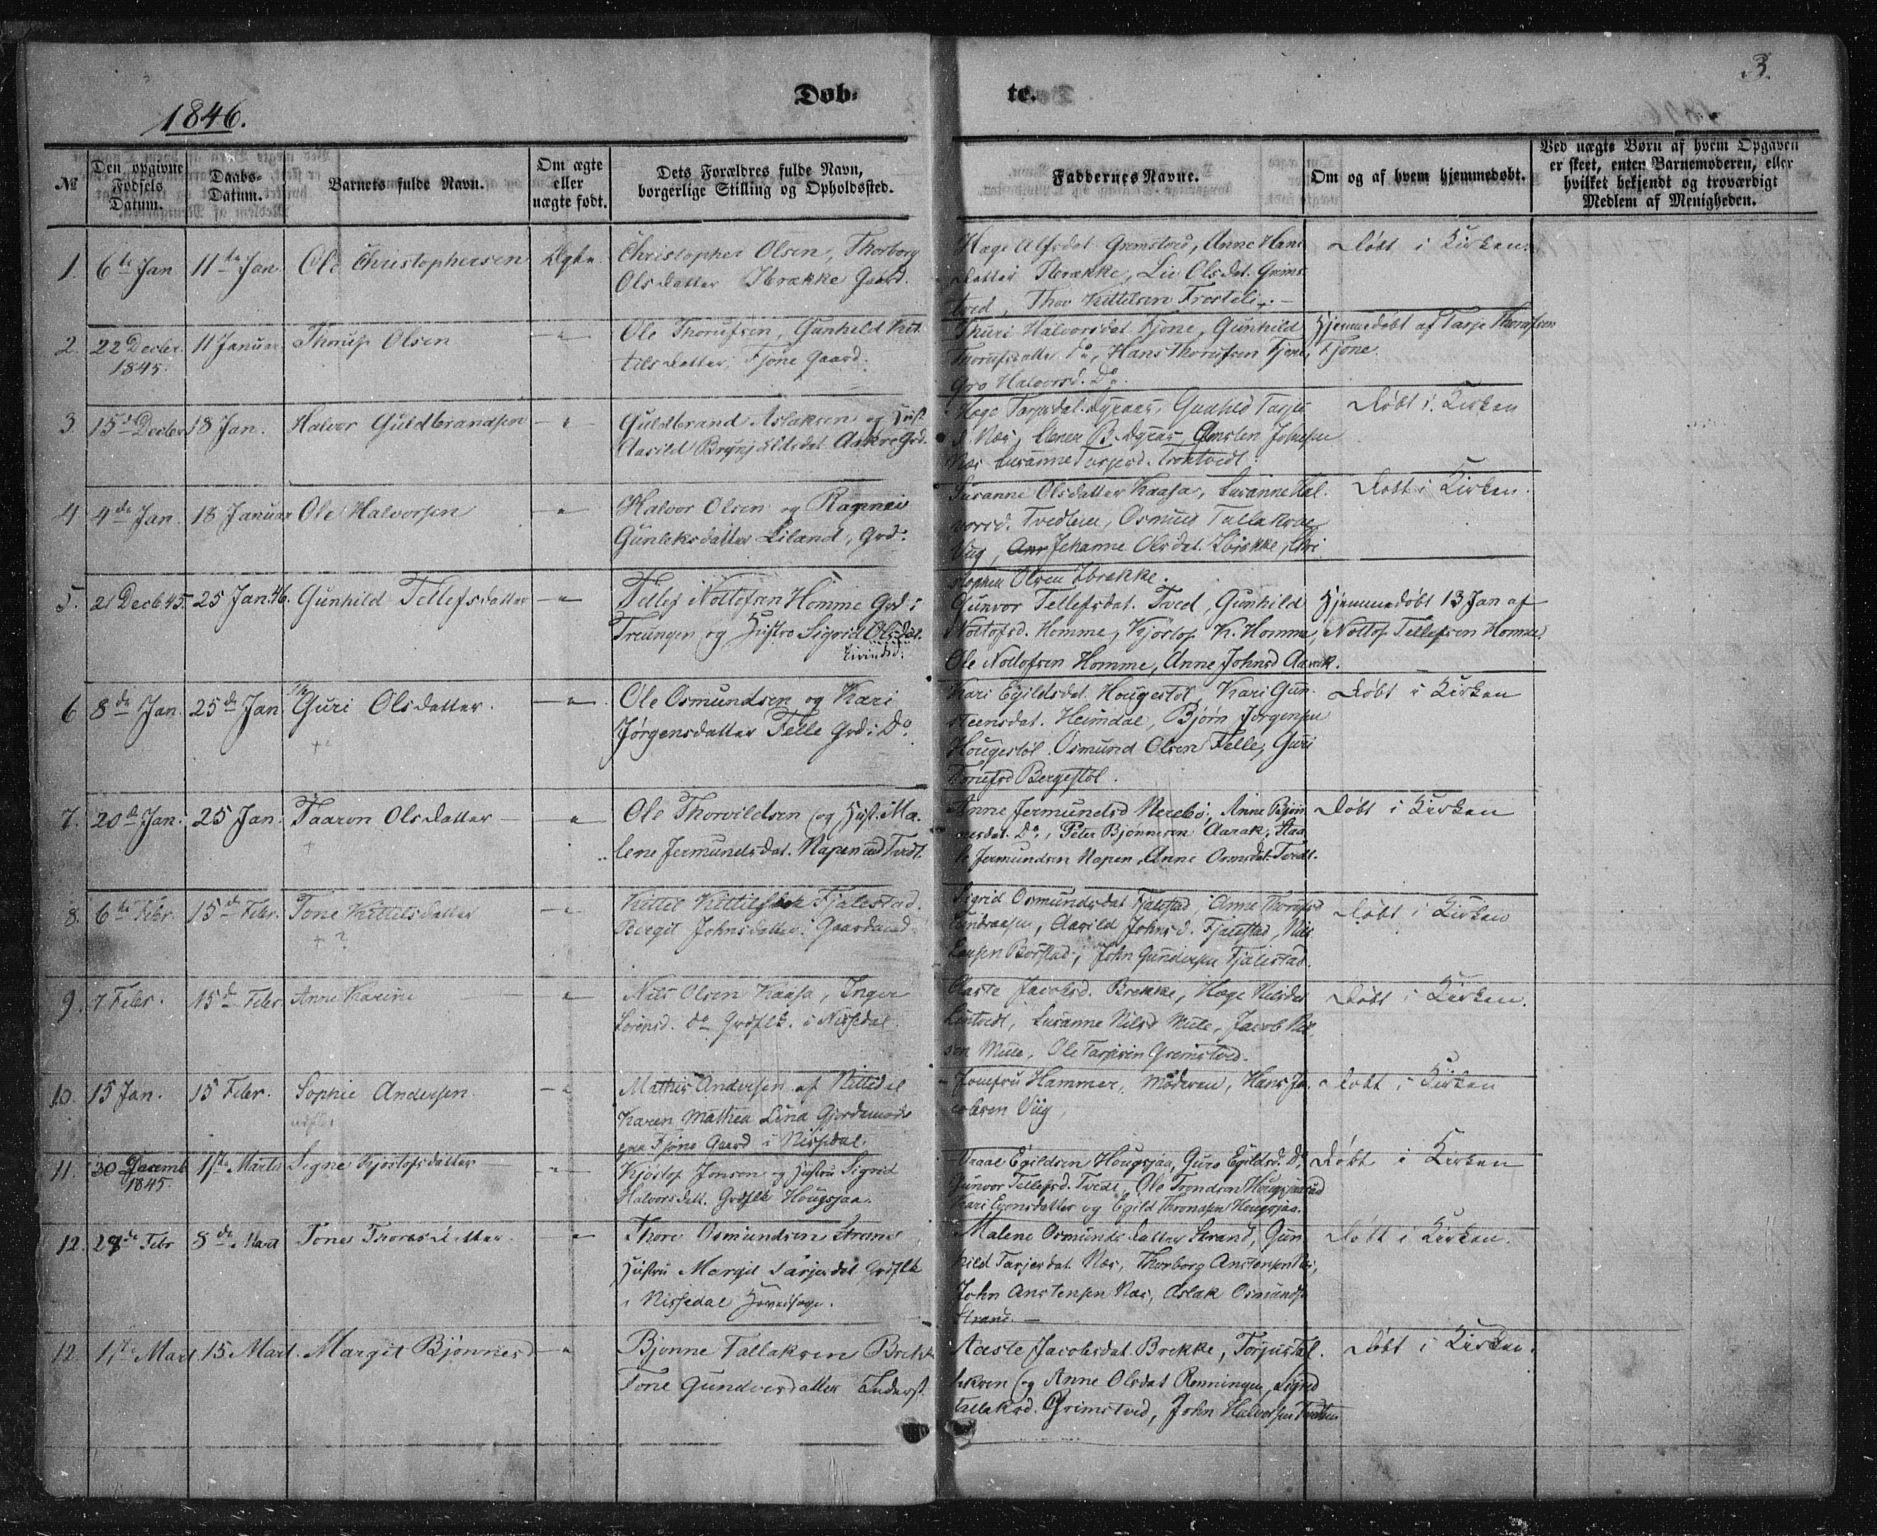 SAKO, Nissedal kirkebøker, F/Fa/L0003: Ministerialbok nr. I 3, 1846-1870, s. 2-3